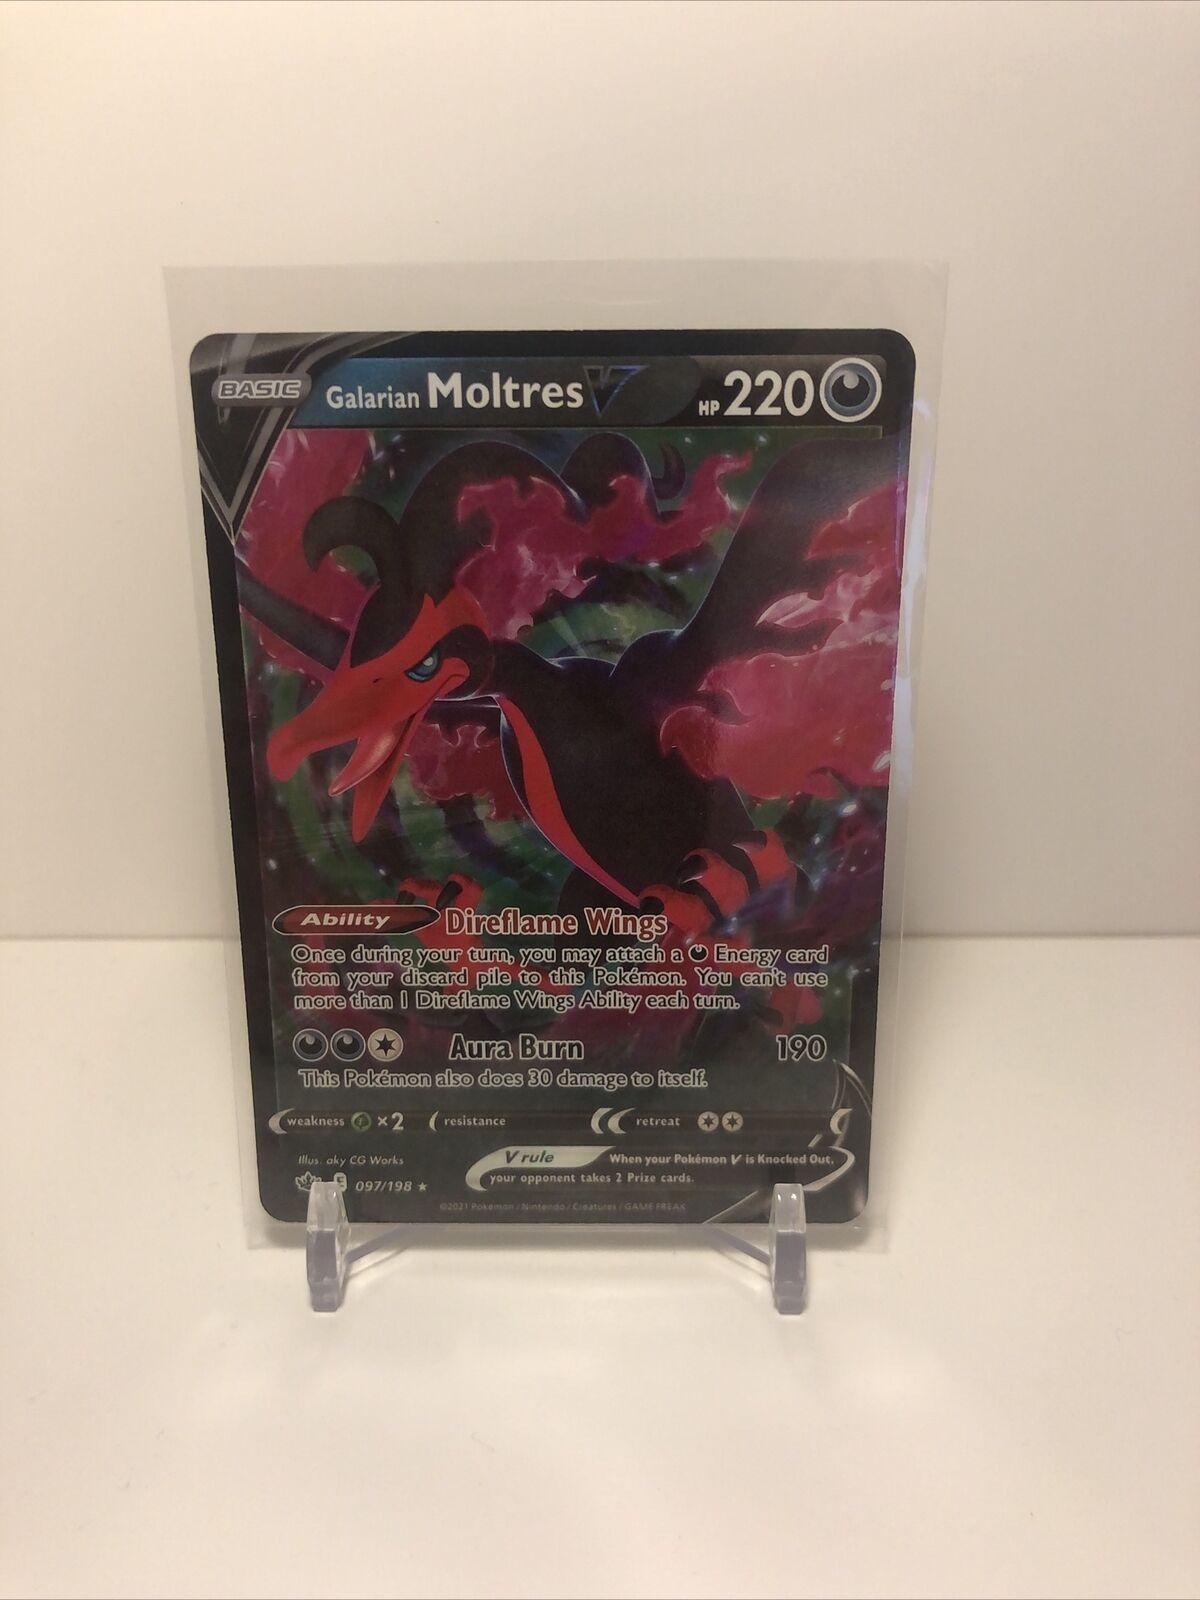 Galarian Moltres V Pokémon Card (Chilling Reign 097/198) Ultra Rare